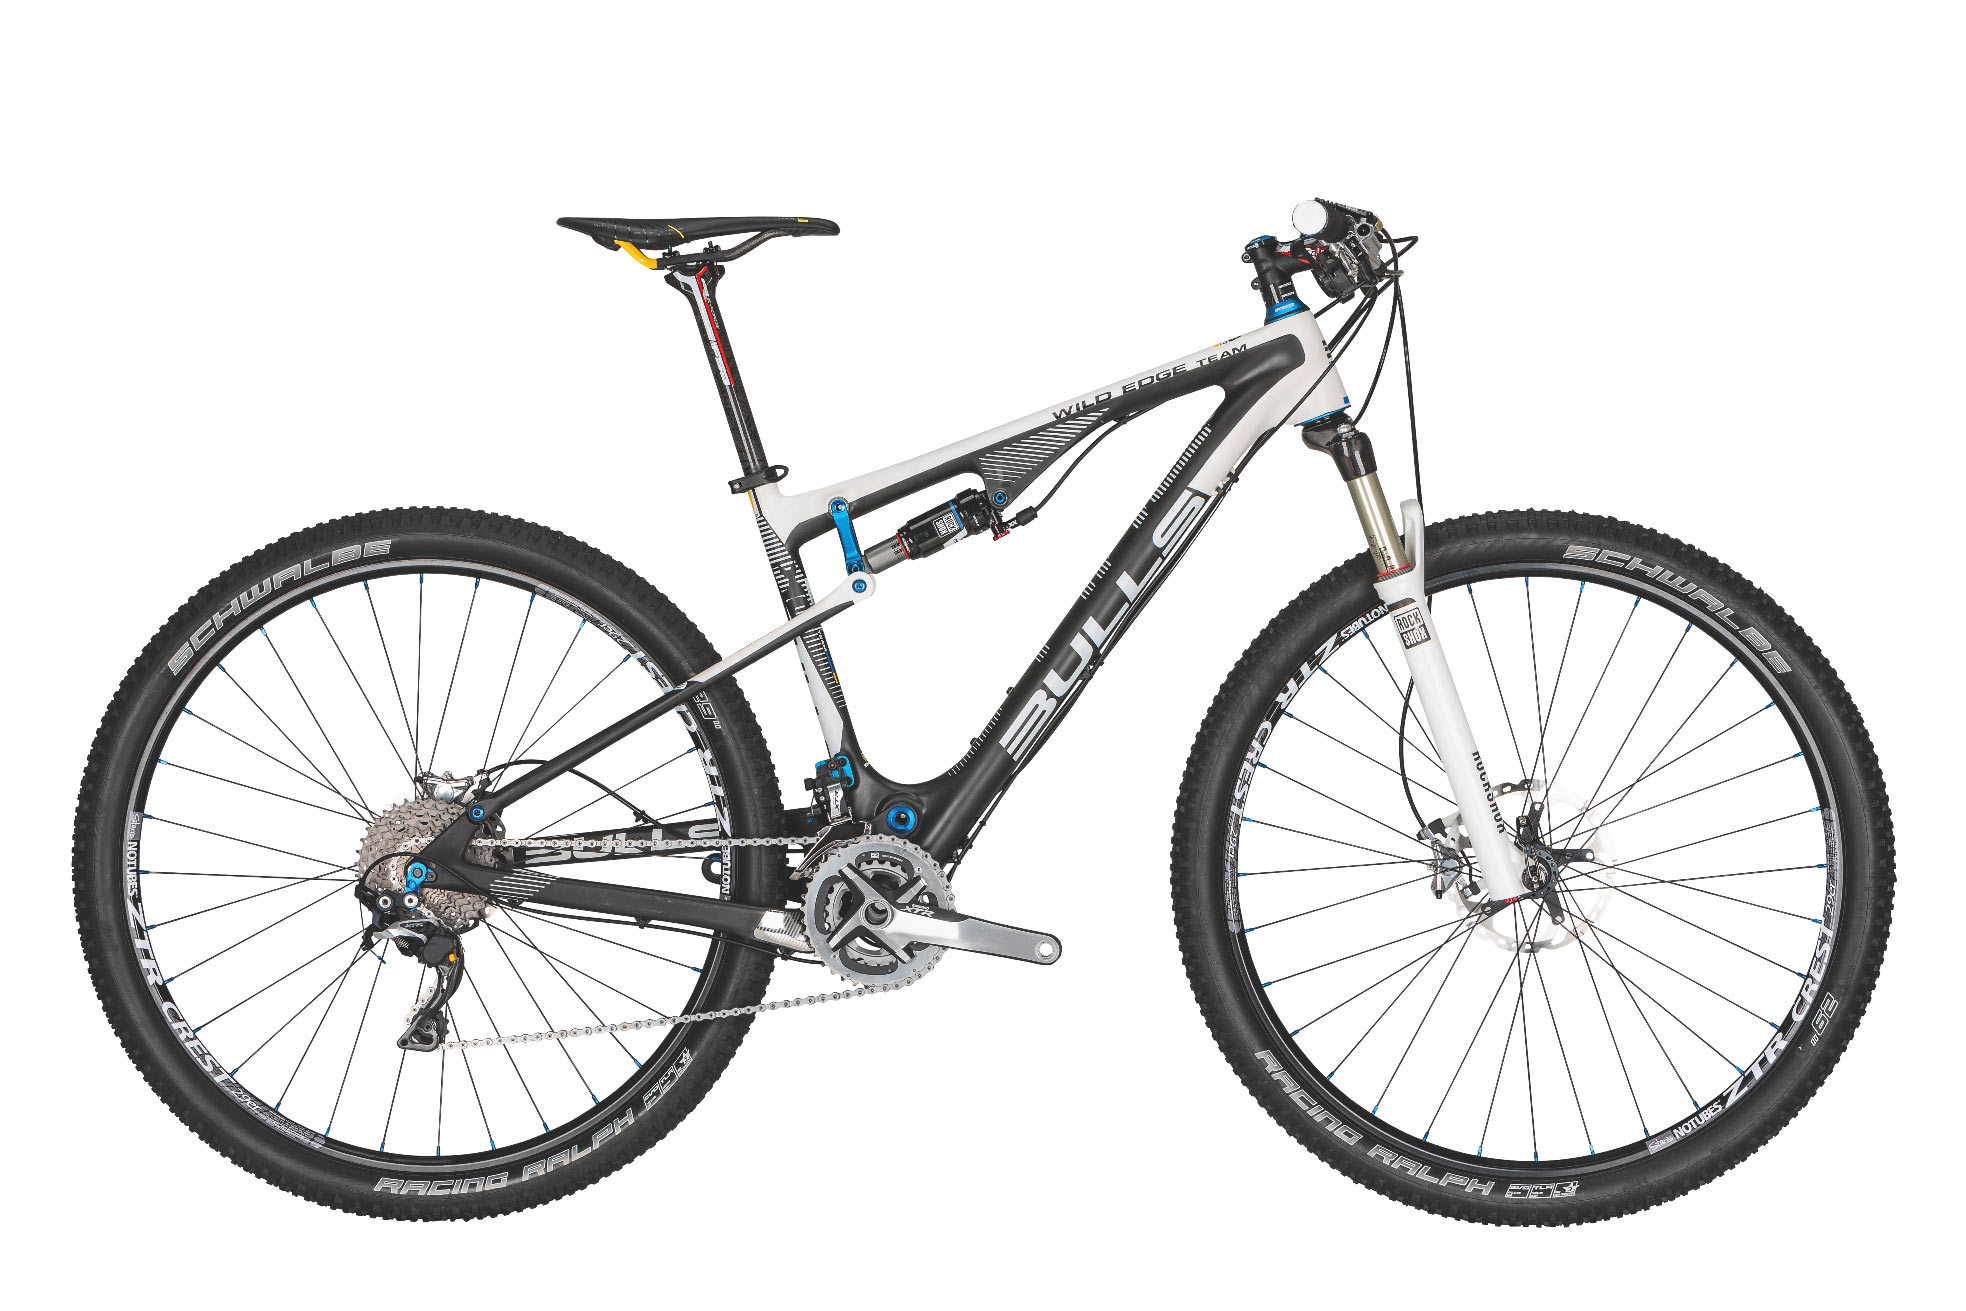 mountainbike bulls wild edge team 29 zoll 29er shimano xtr carbon fully 56 cm ebay. Black Bedroom Furniture Sets. Home Design Ideas